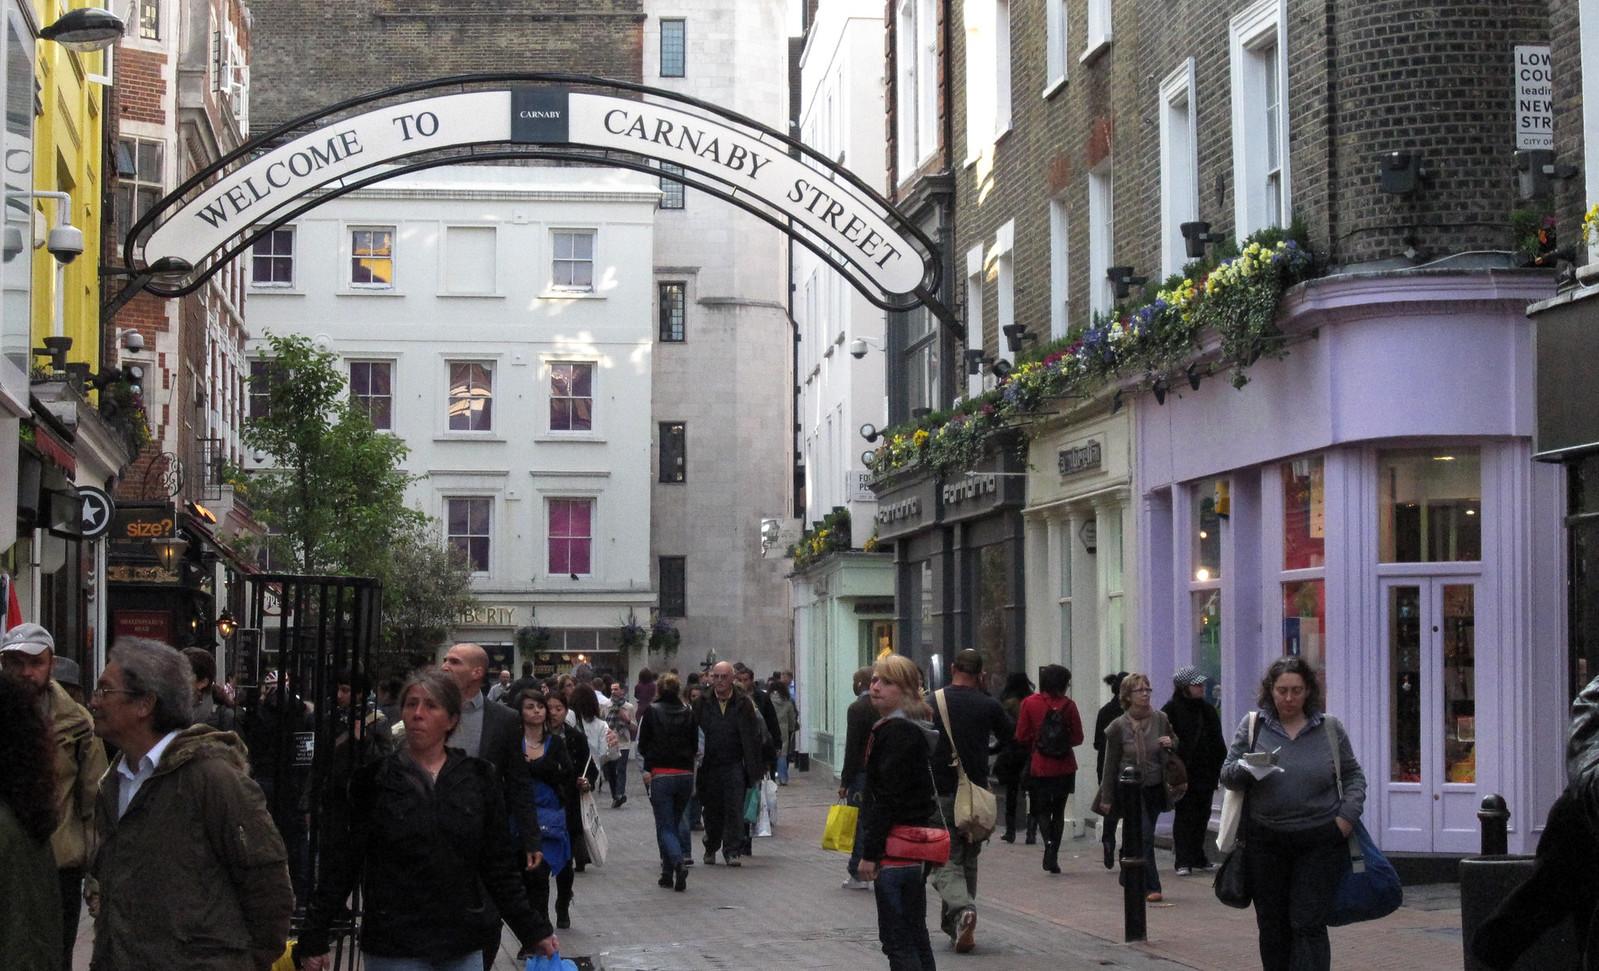 London 301 Carnaby Street